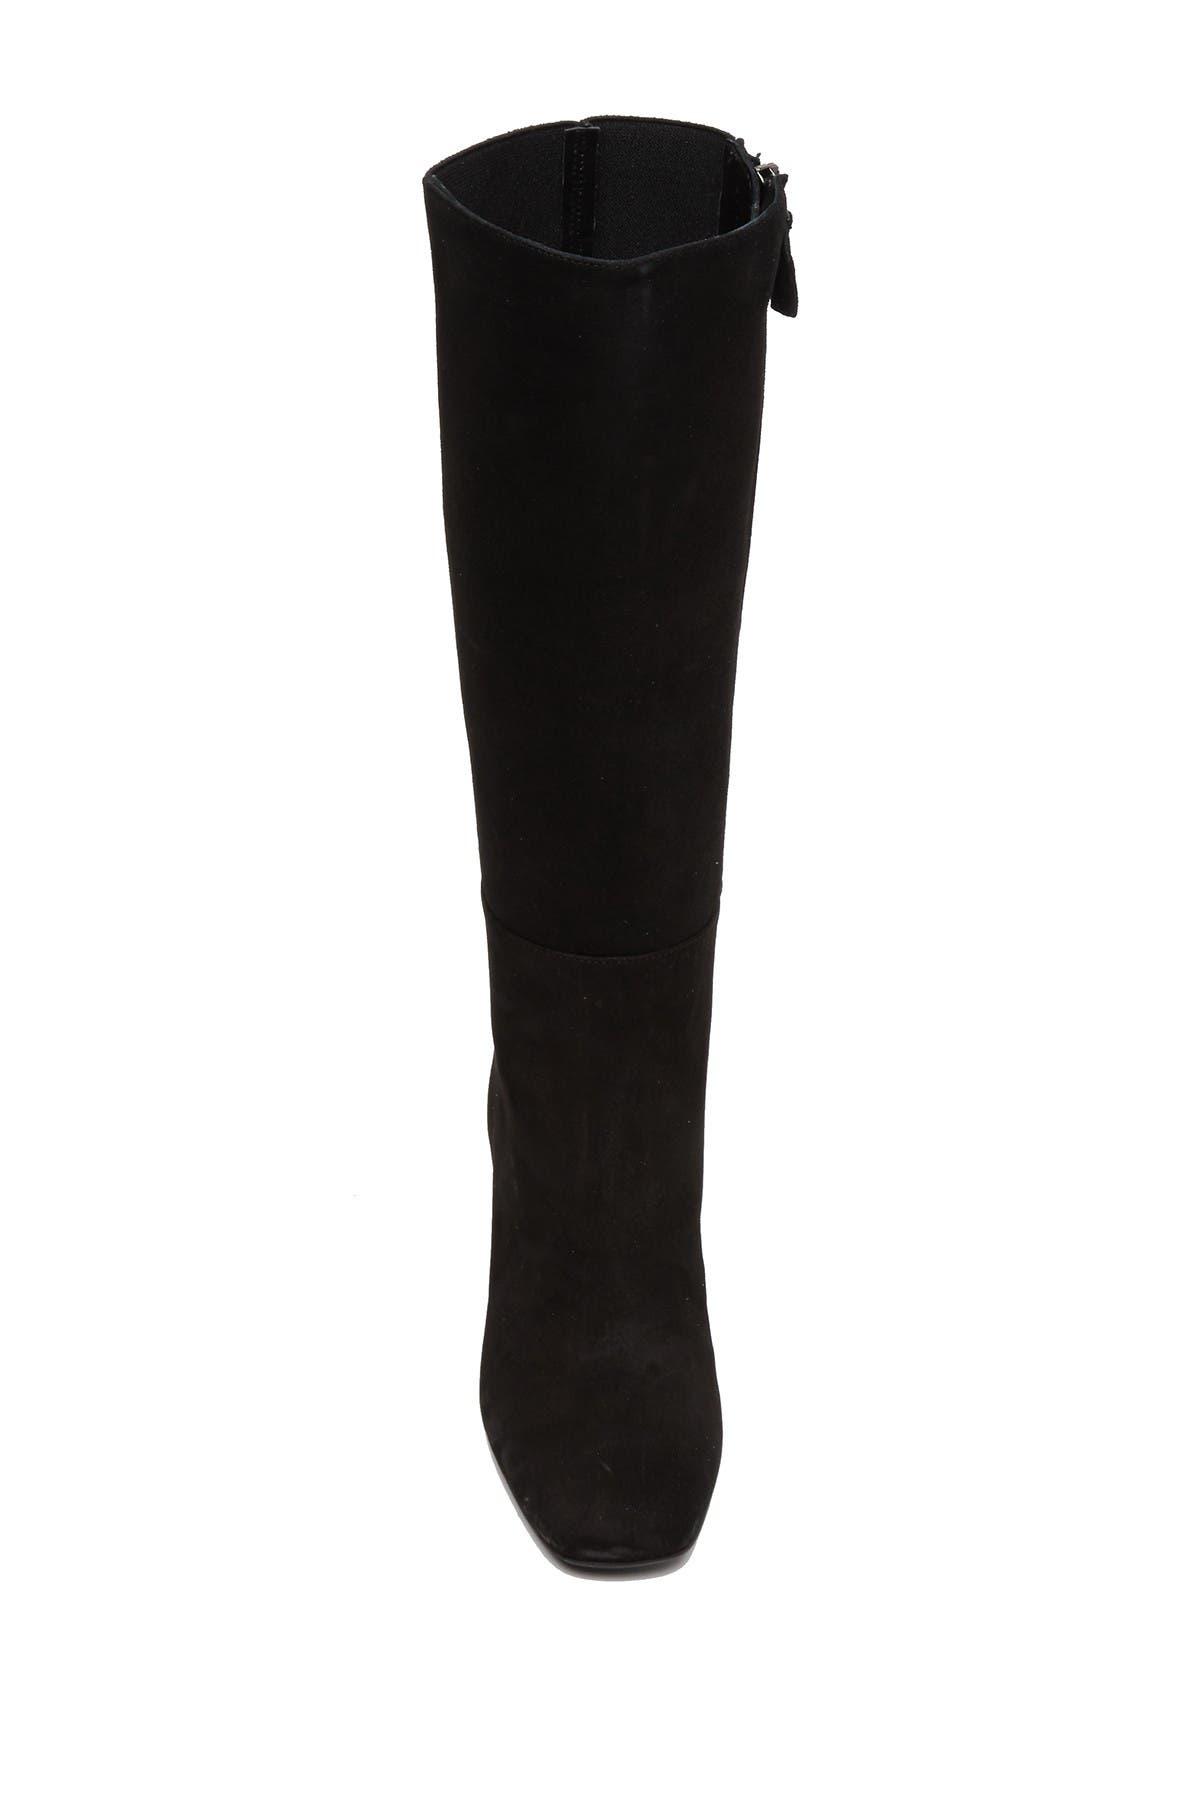 Aquatalia   Janie Dress Weatherproof